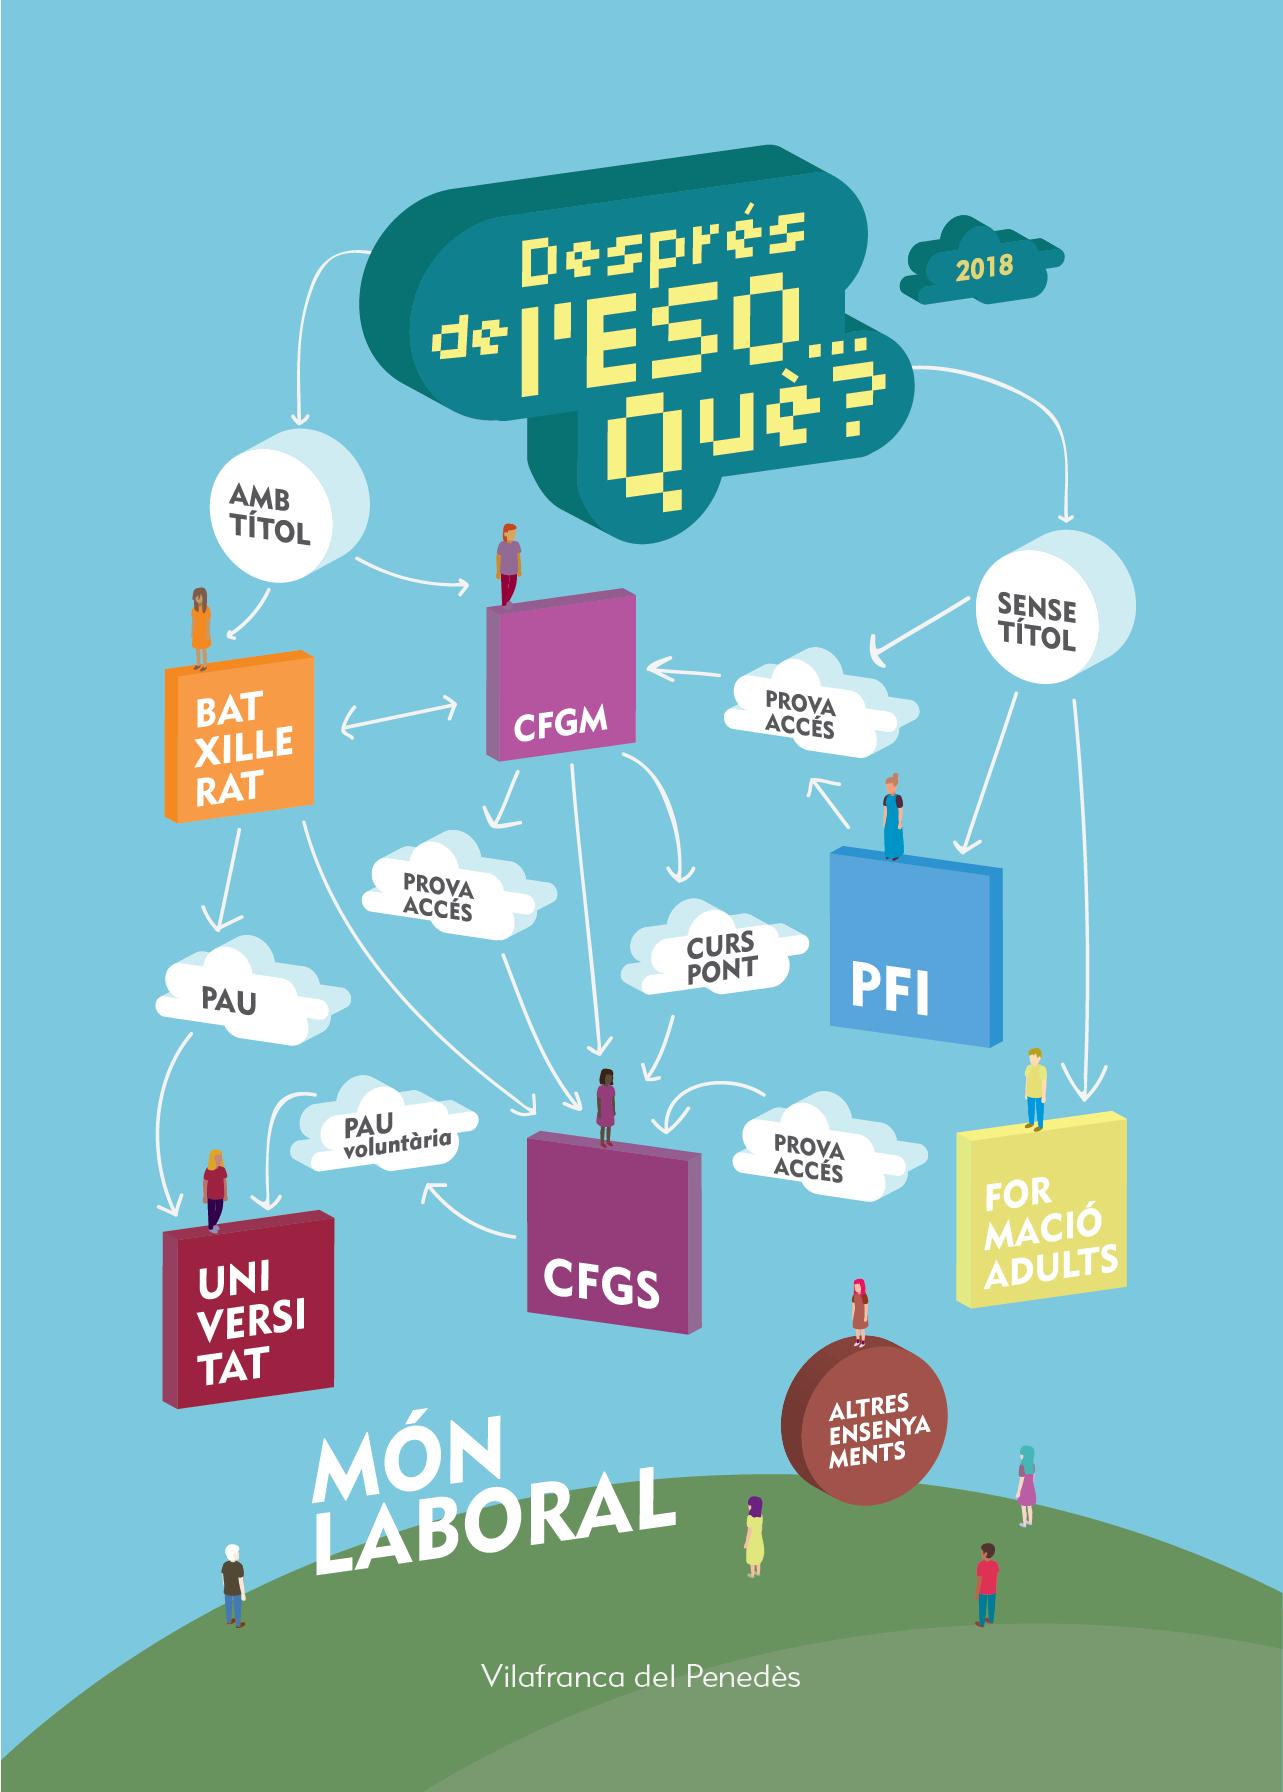 Disculpi-Studio-Despres-de-lESO-Que-Campanya-Vilafranca-del-Penedes-Disseny